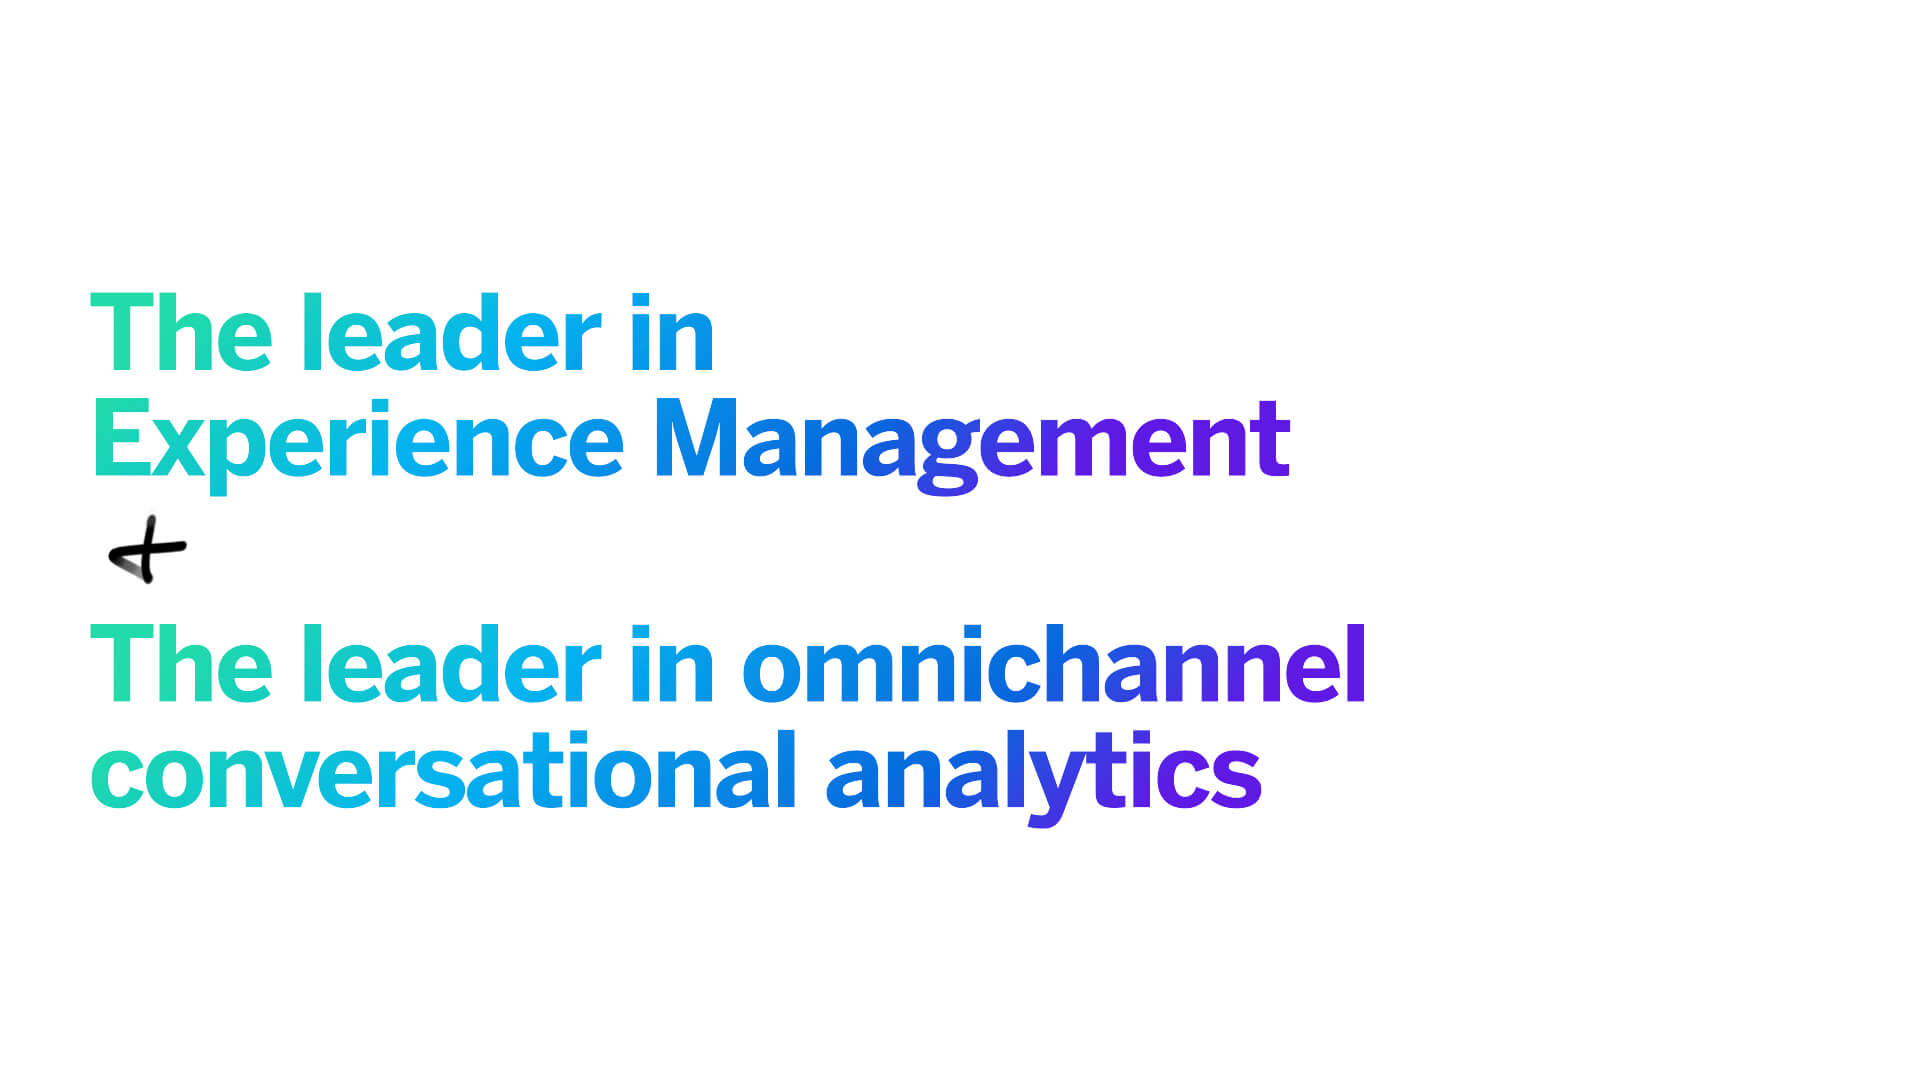 Qualtrics & Clarabridge - The leader in XM and omnichannel conversational analytics